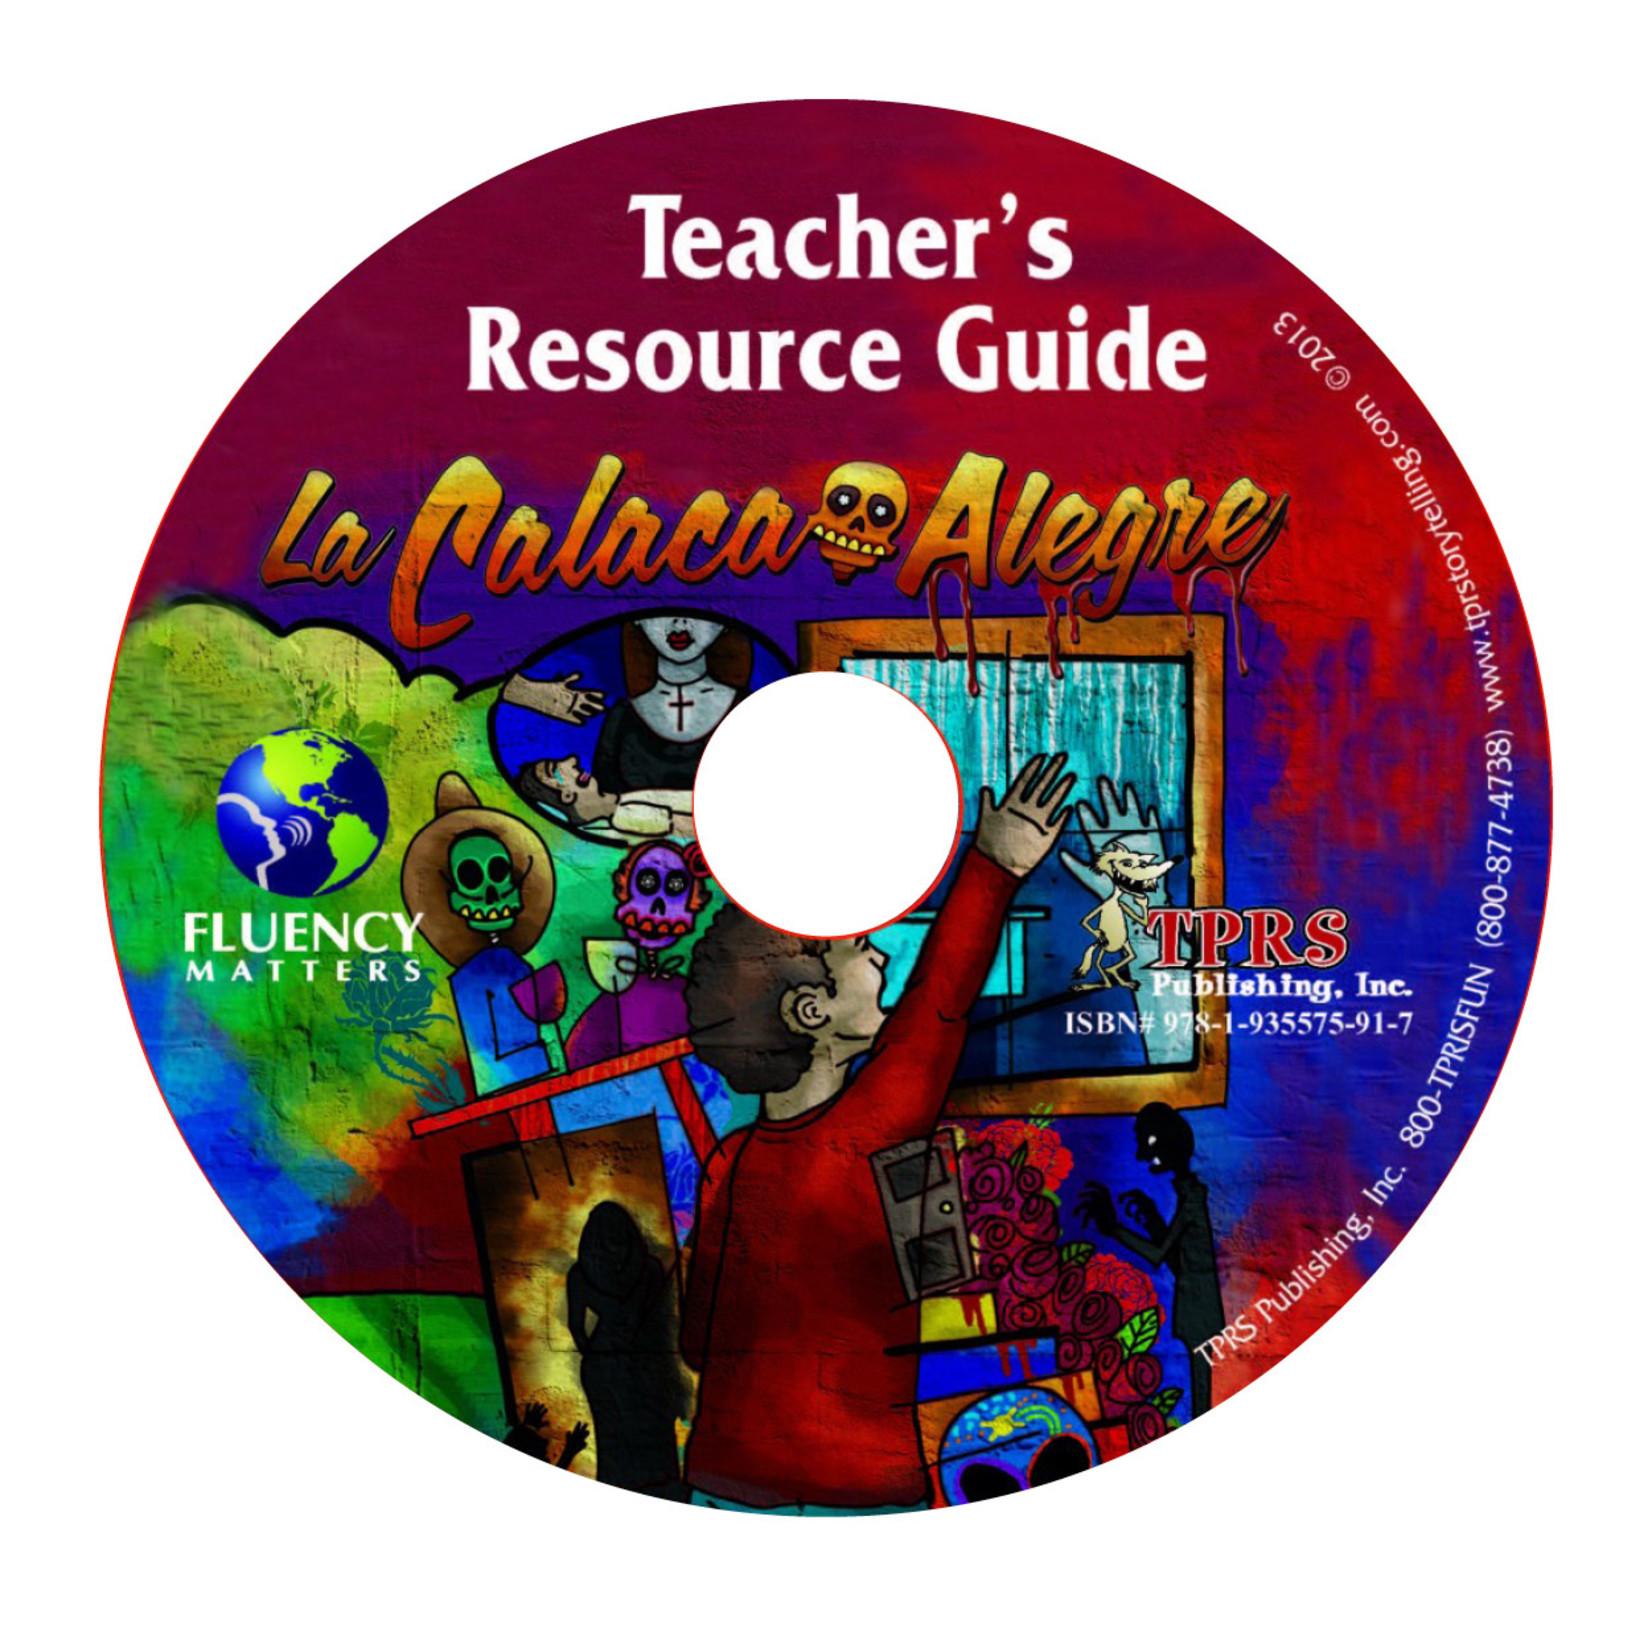 Fluency Matters La Calaca Alegre - Docentenhandleiding